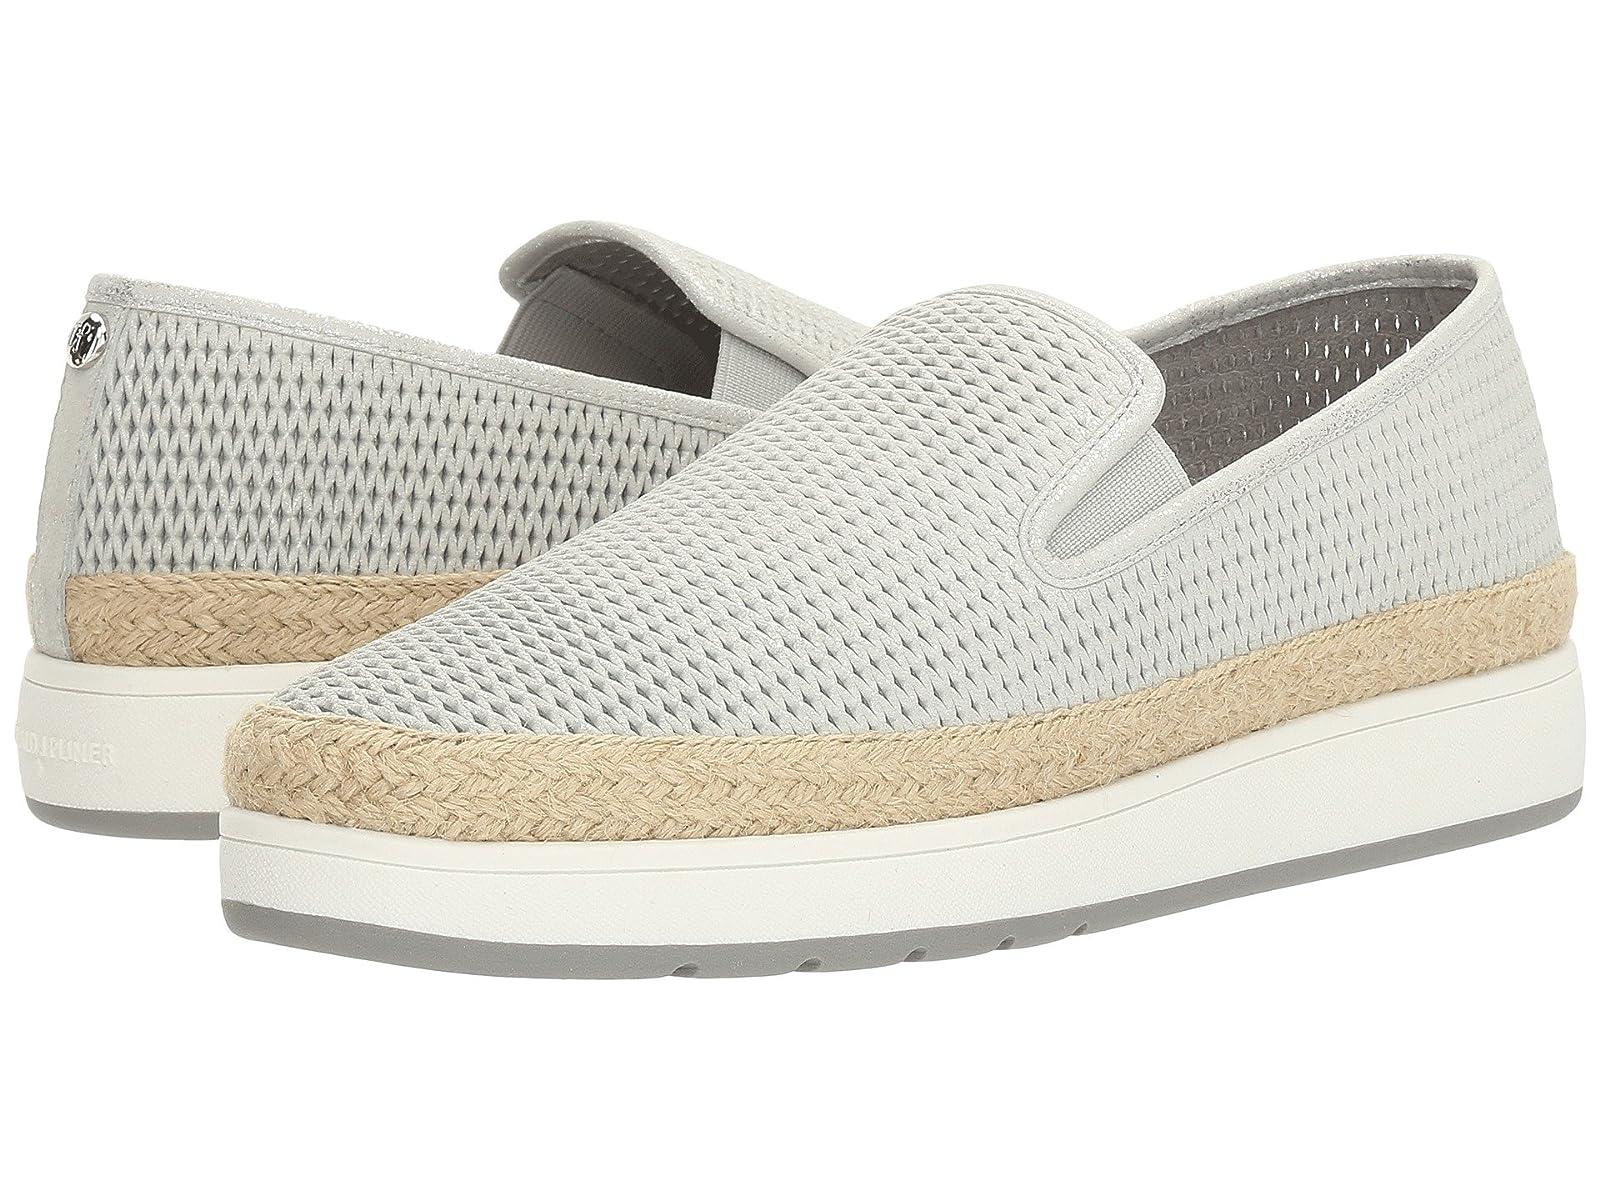 Donald J Pliner MaiteCheap and distinctive eye-catching shoes